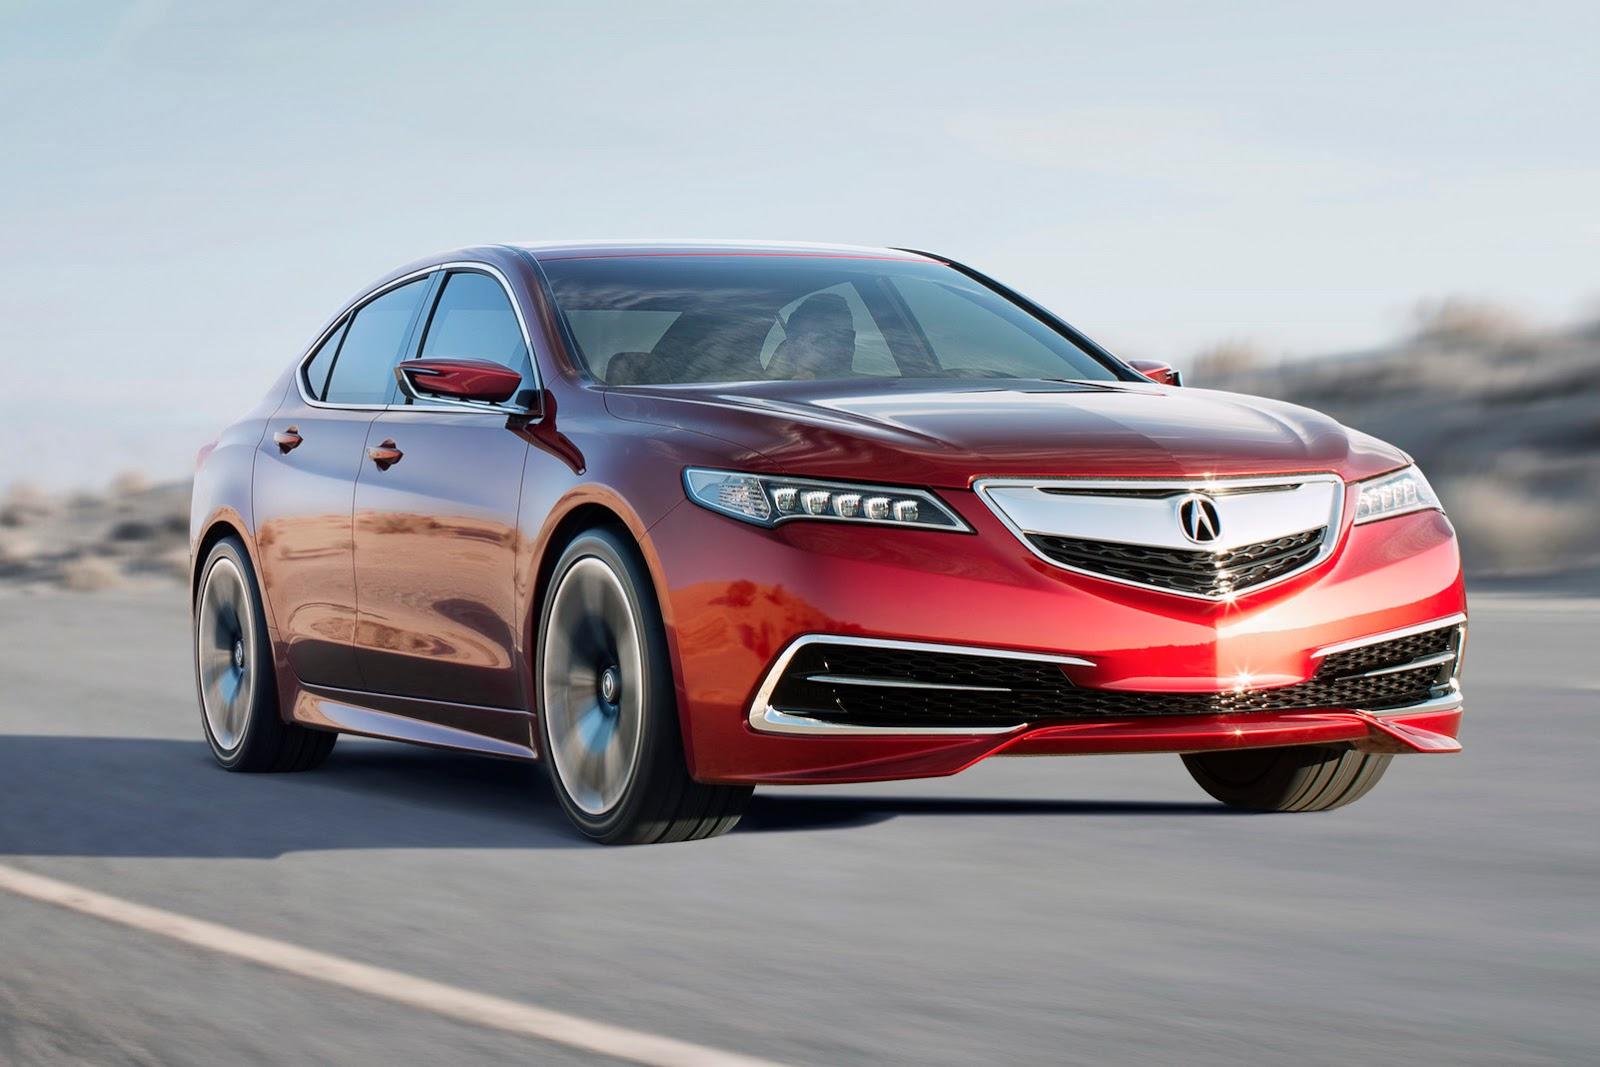 2014 - [Acura] TLX New-Acura-TLX-Prototype-13